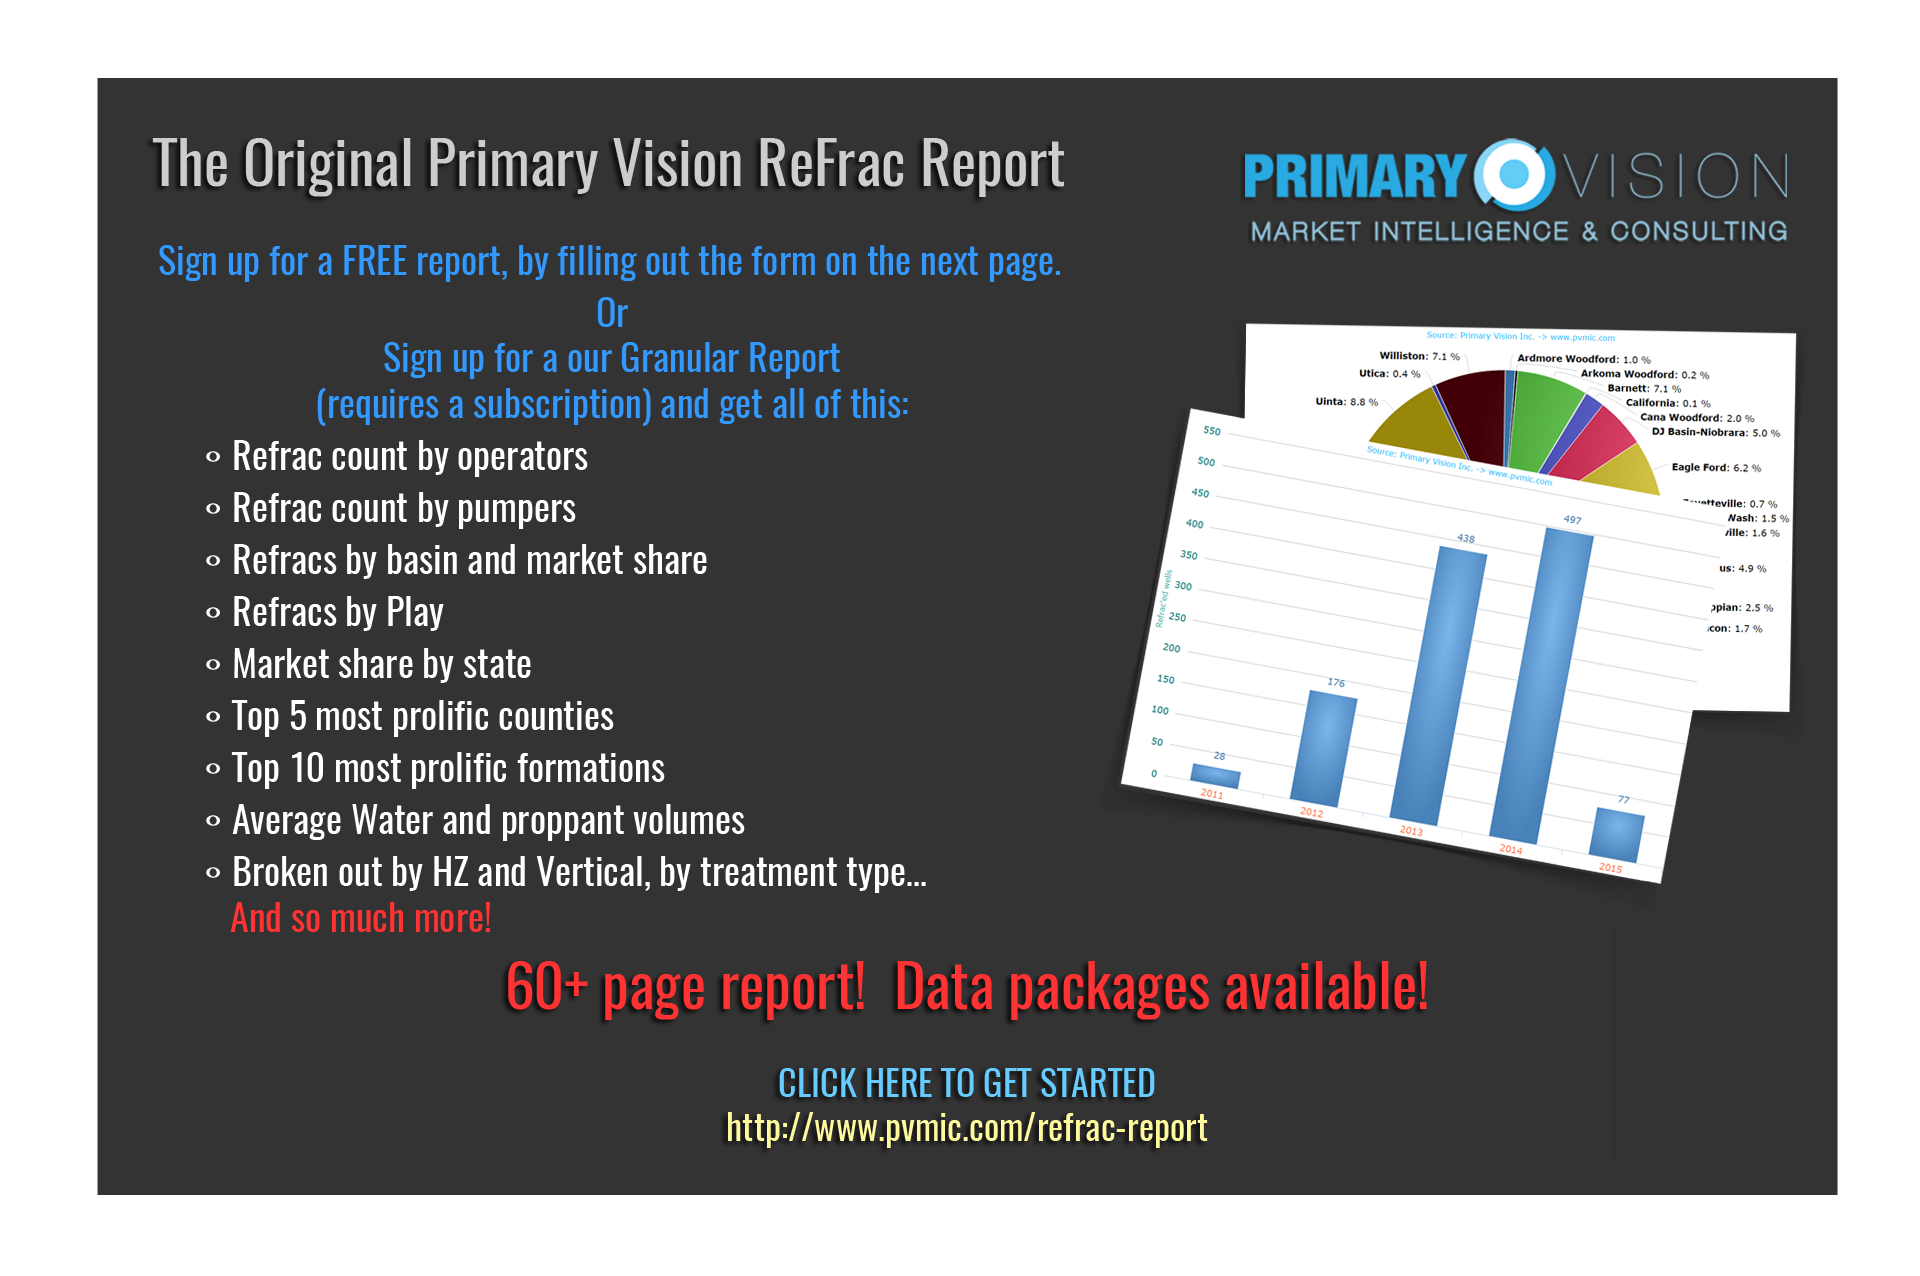 http://www.pvmic.com/refrac-report/